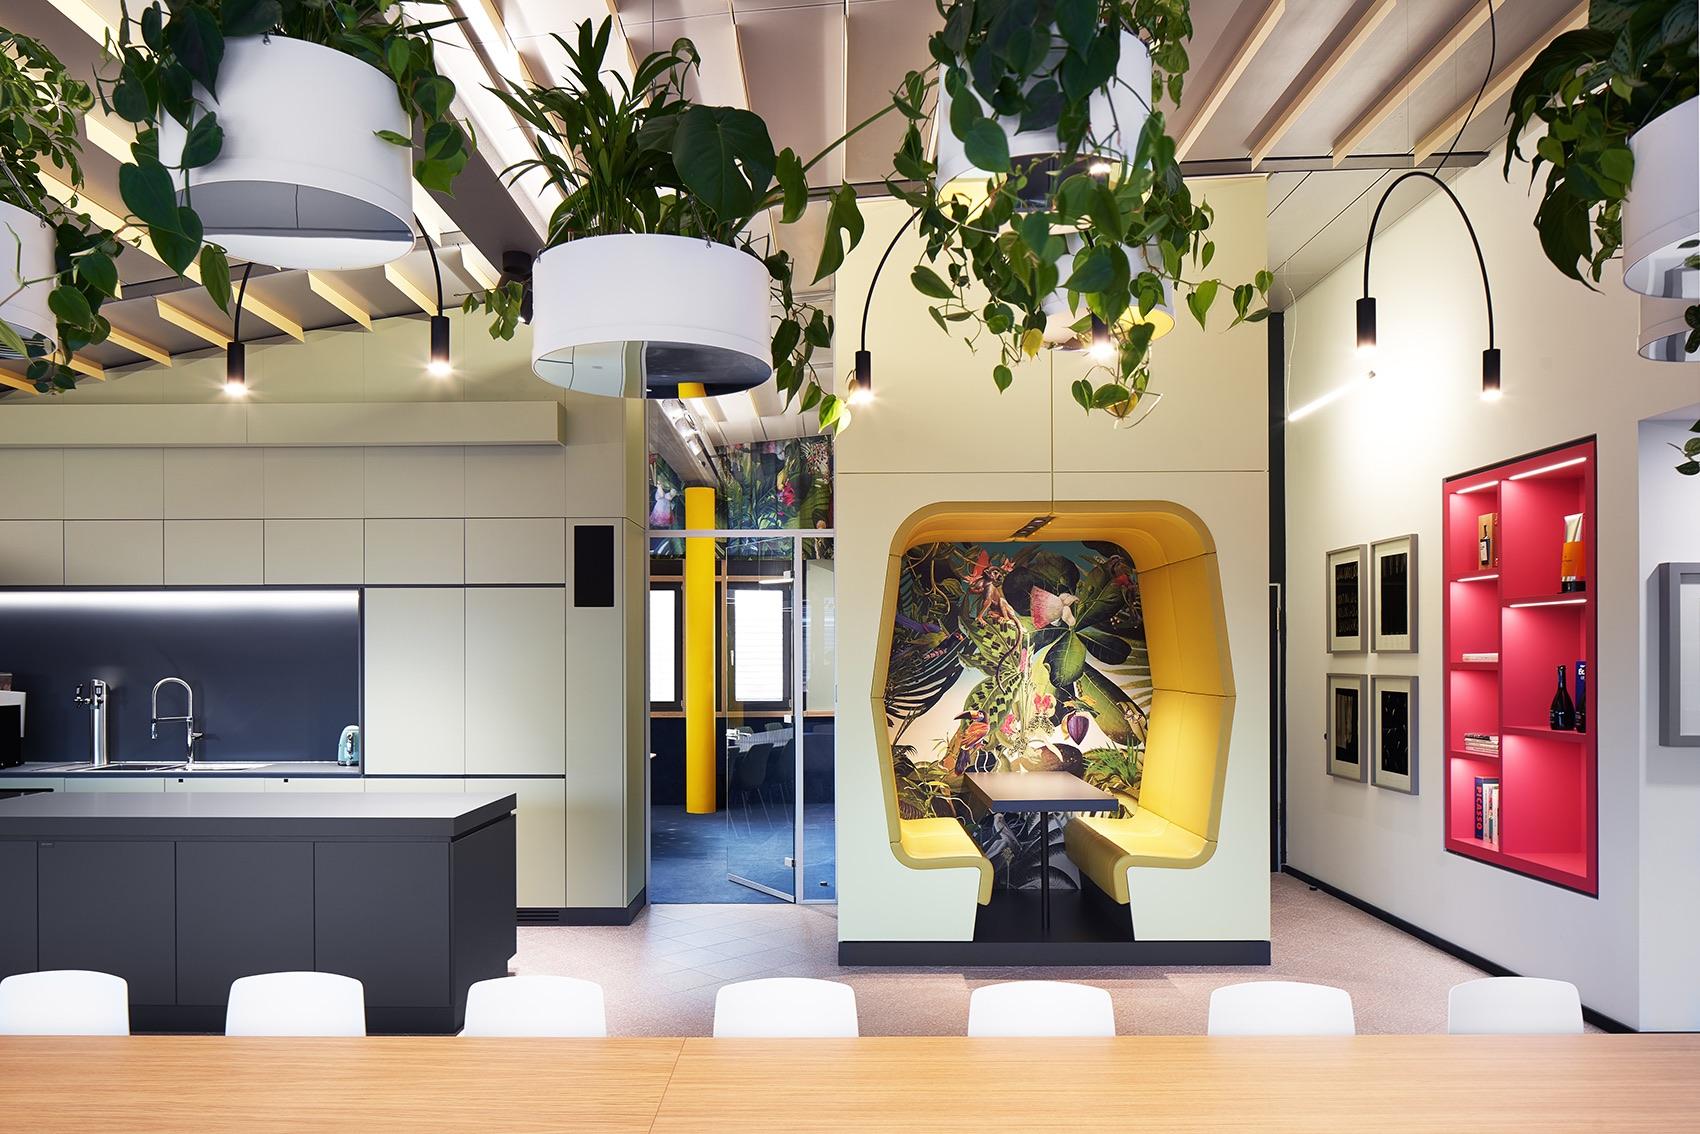 roman-klis-design-office-9